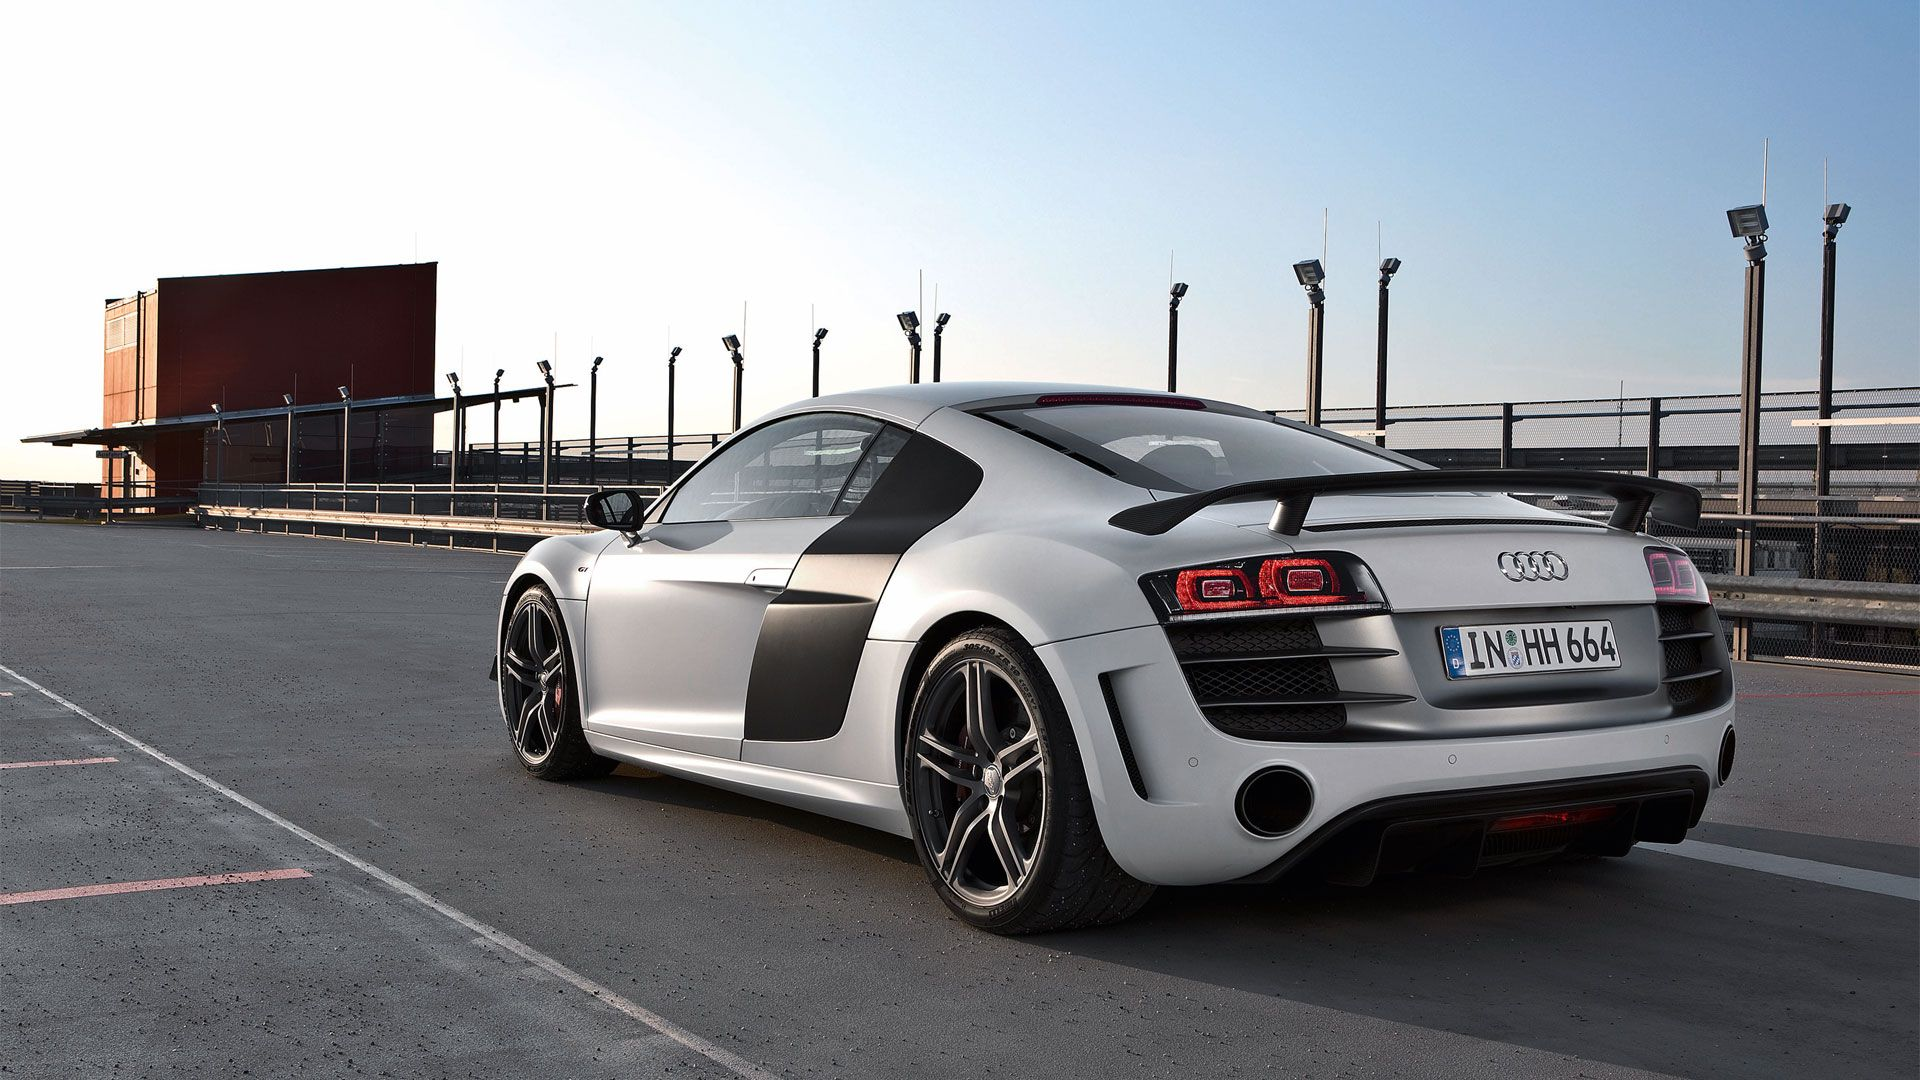 Audi r8 4802 1920x1080 px ~ HDWallSource.com